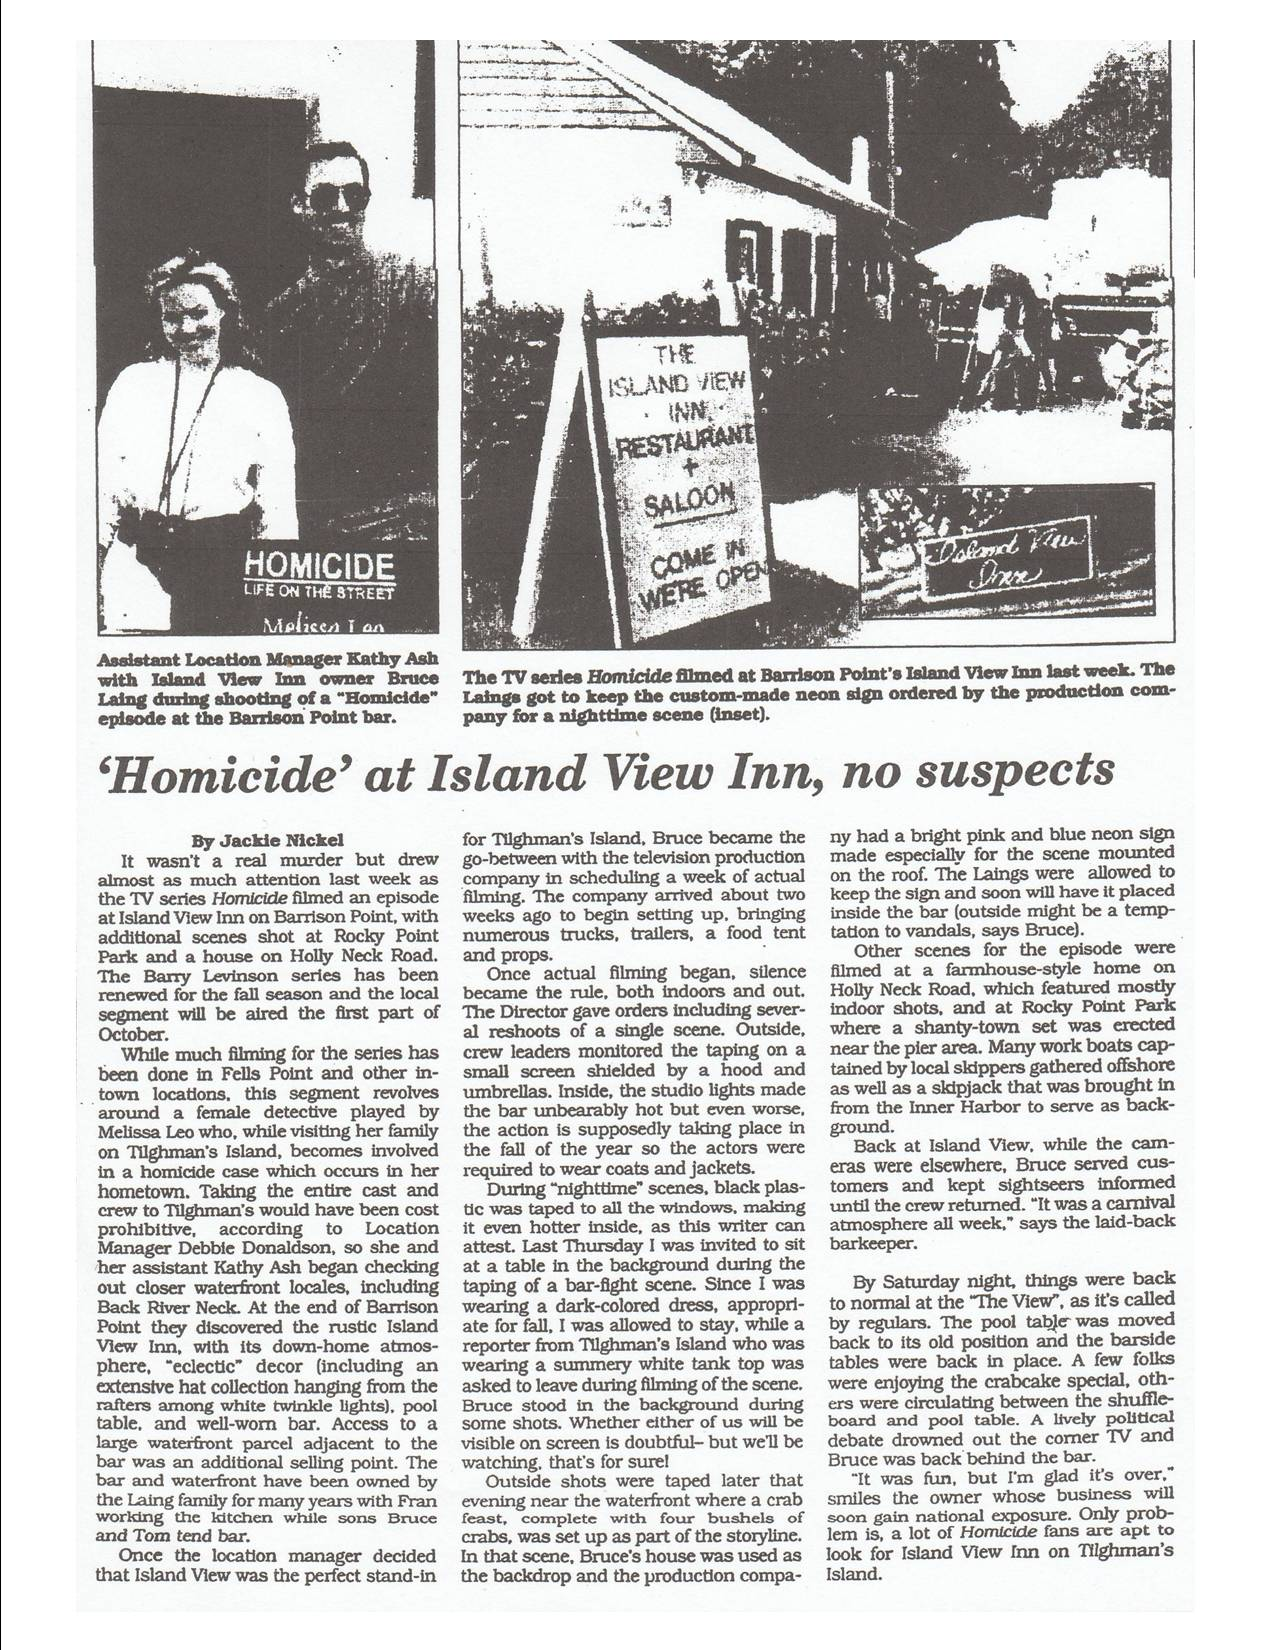 Homicide article